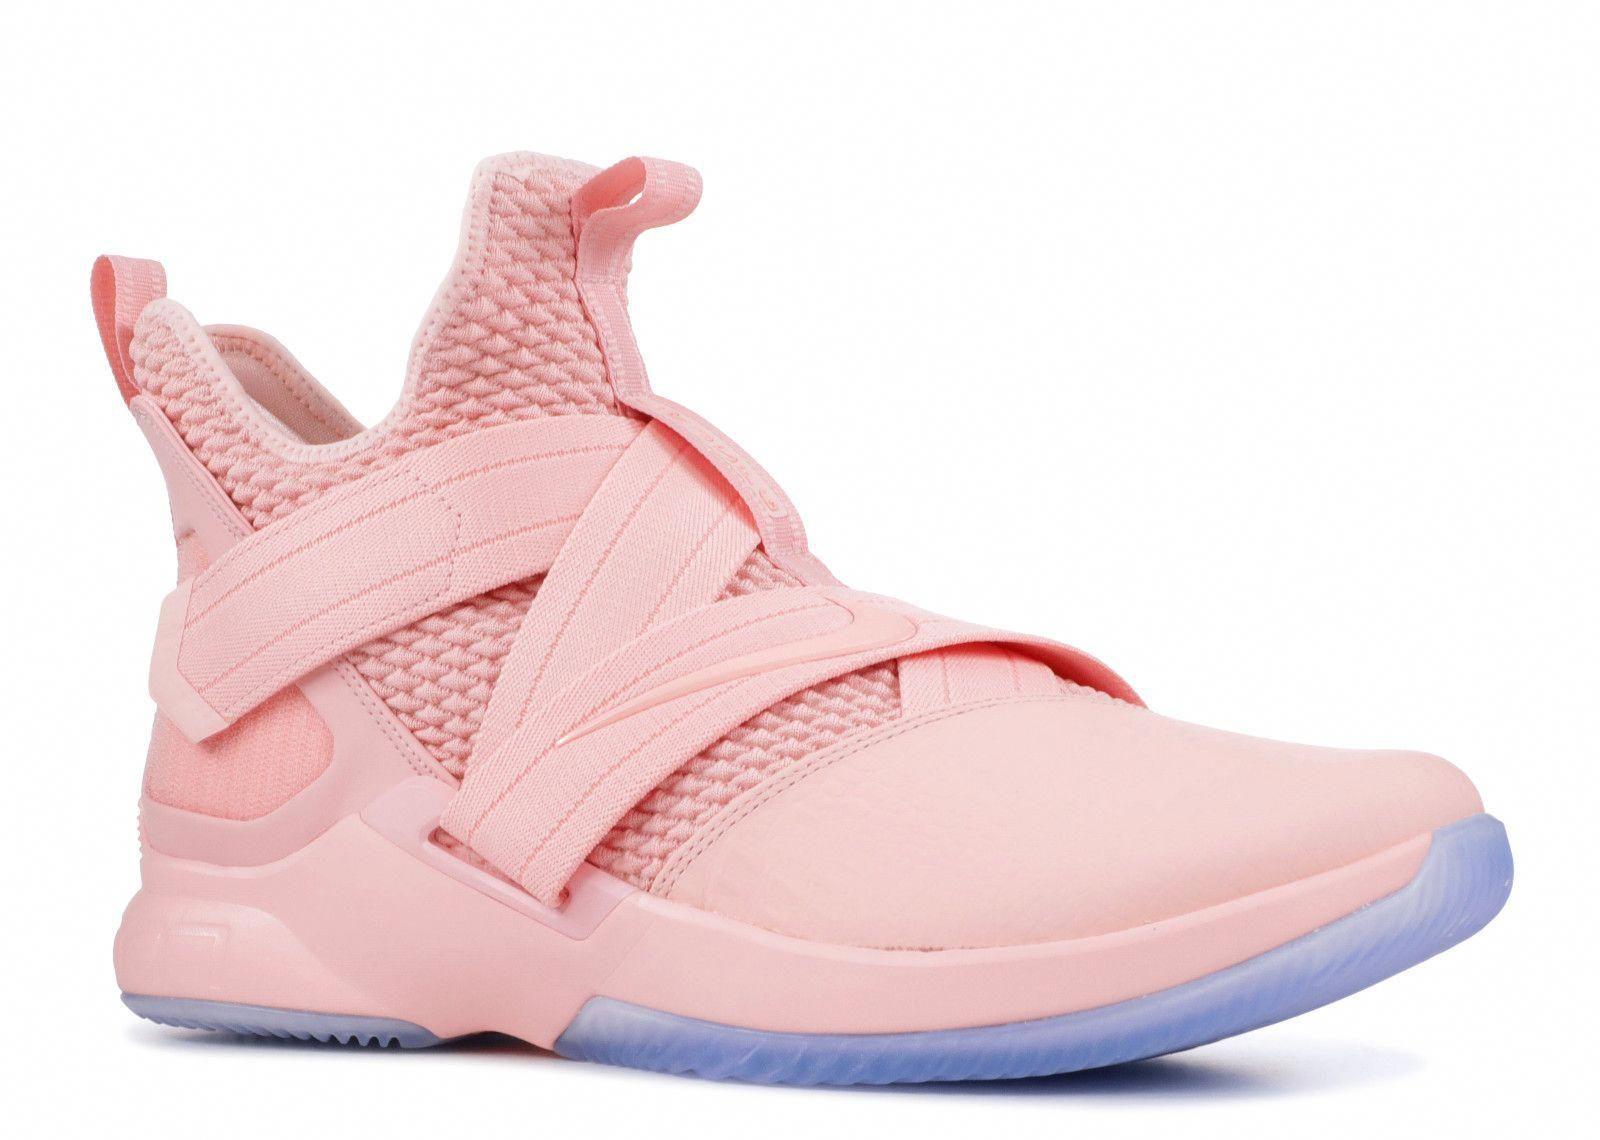 lapso Archivo deberes  Inexpensive Basketball Shoes Key: 8165292592 #AdidasBasketballShoes | Girls basketball  shoes, Pink basketball shoes, Best basketball shoes